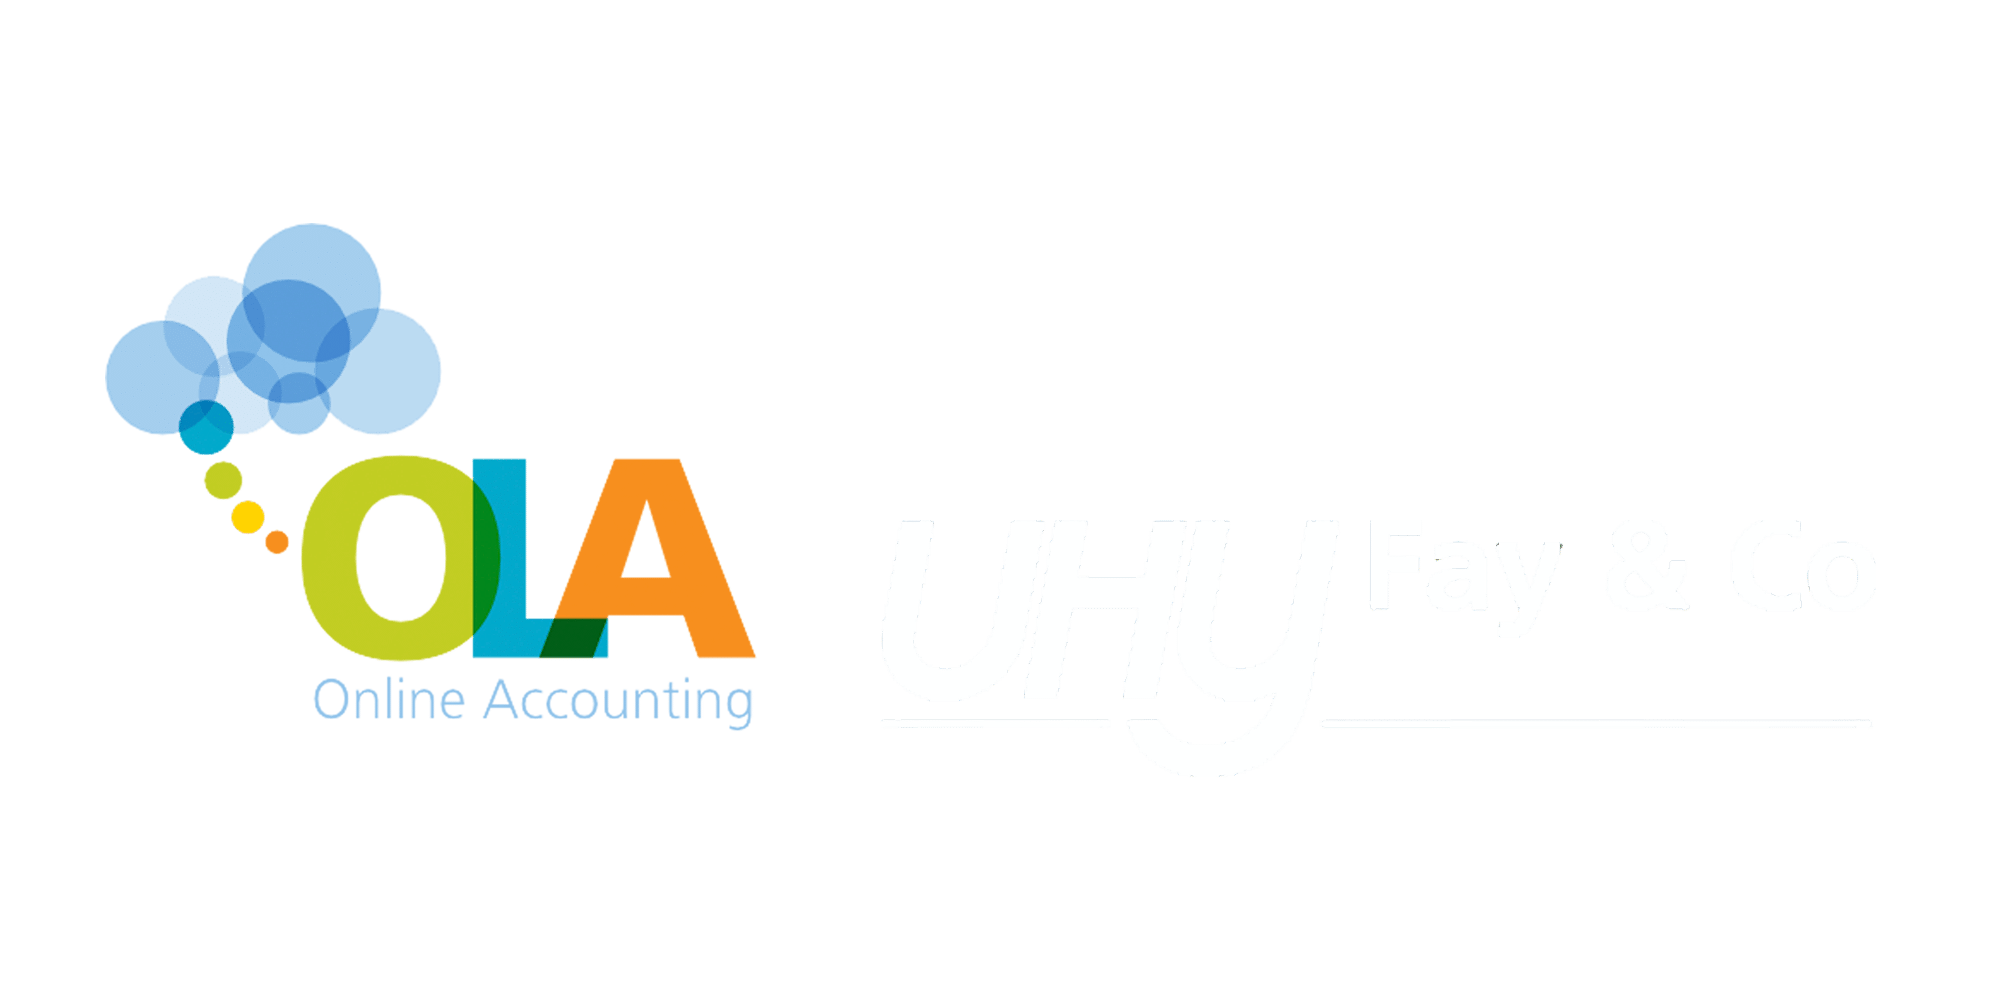 OLA Accounting